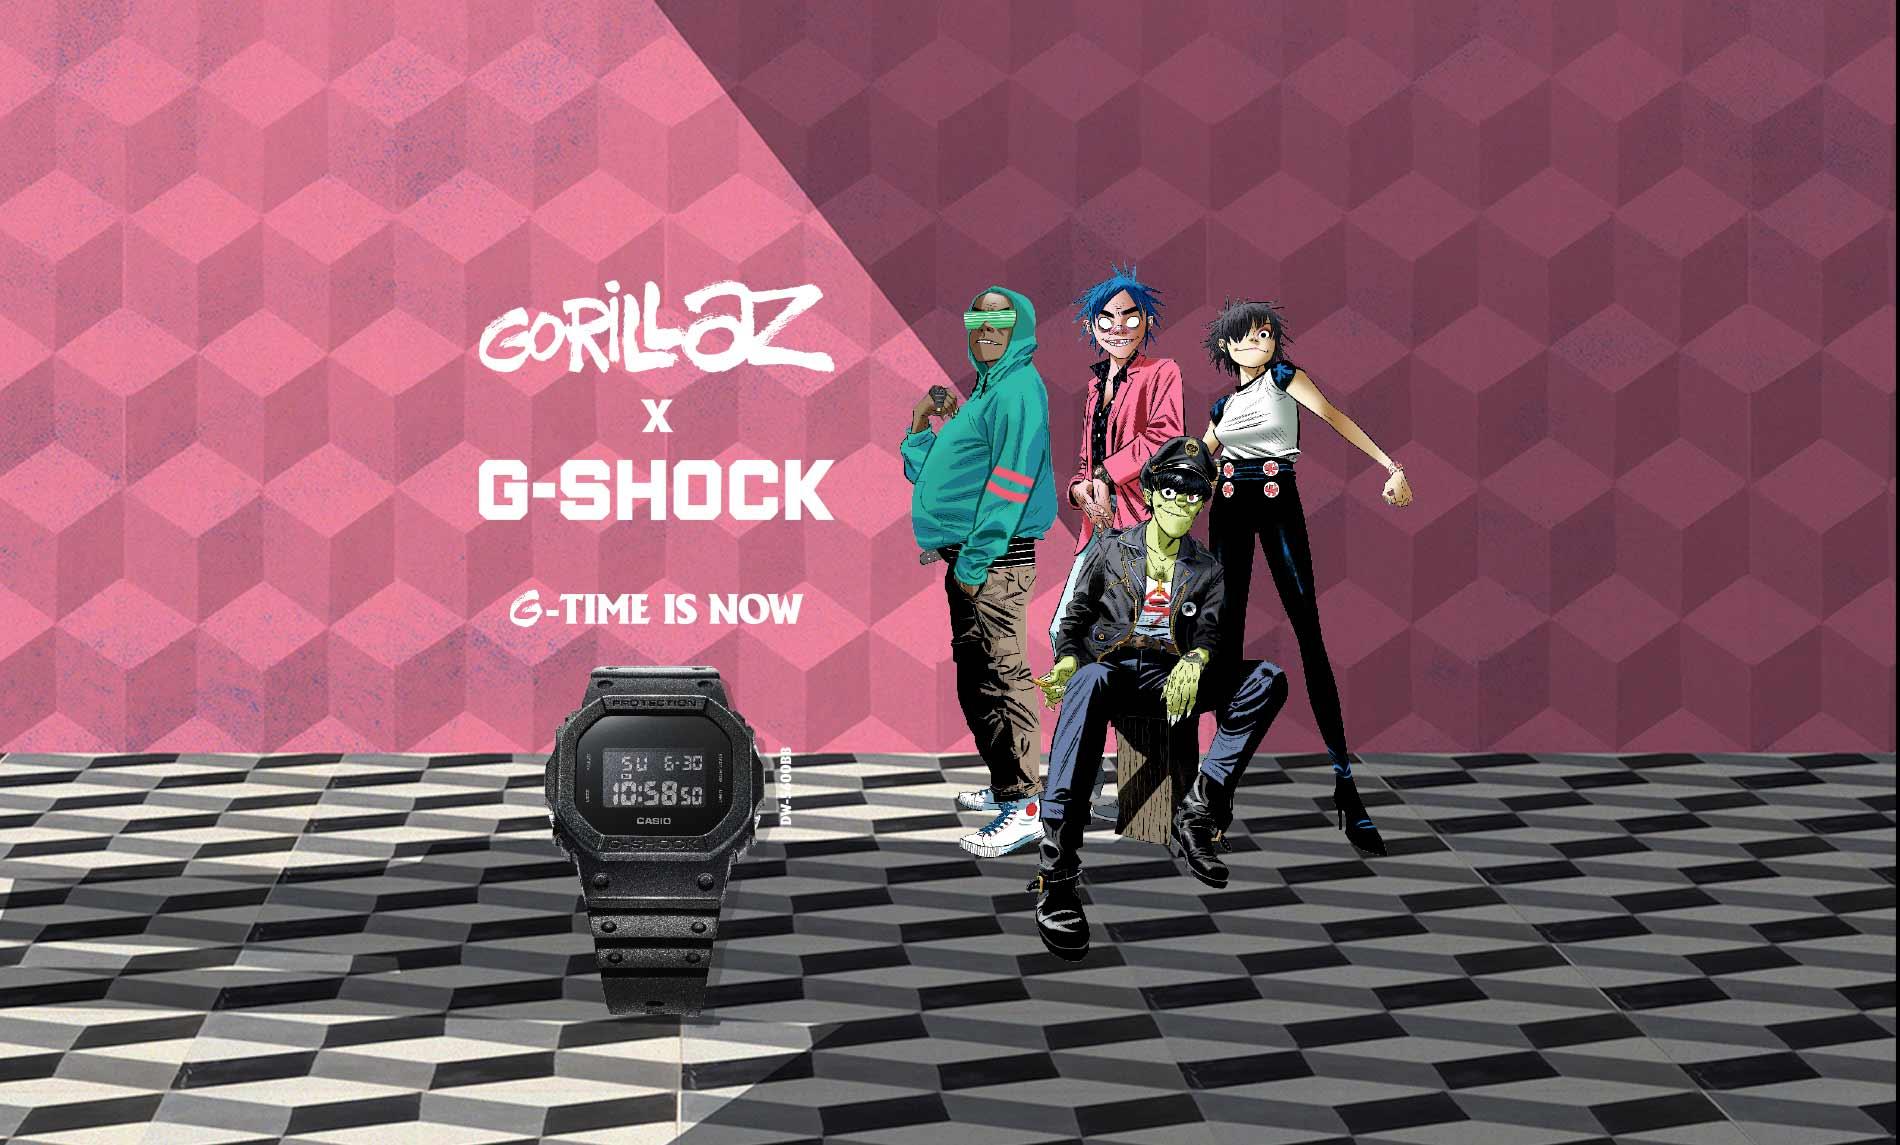 Gorillaz G-SHOCK